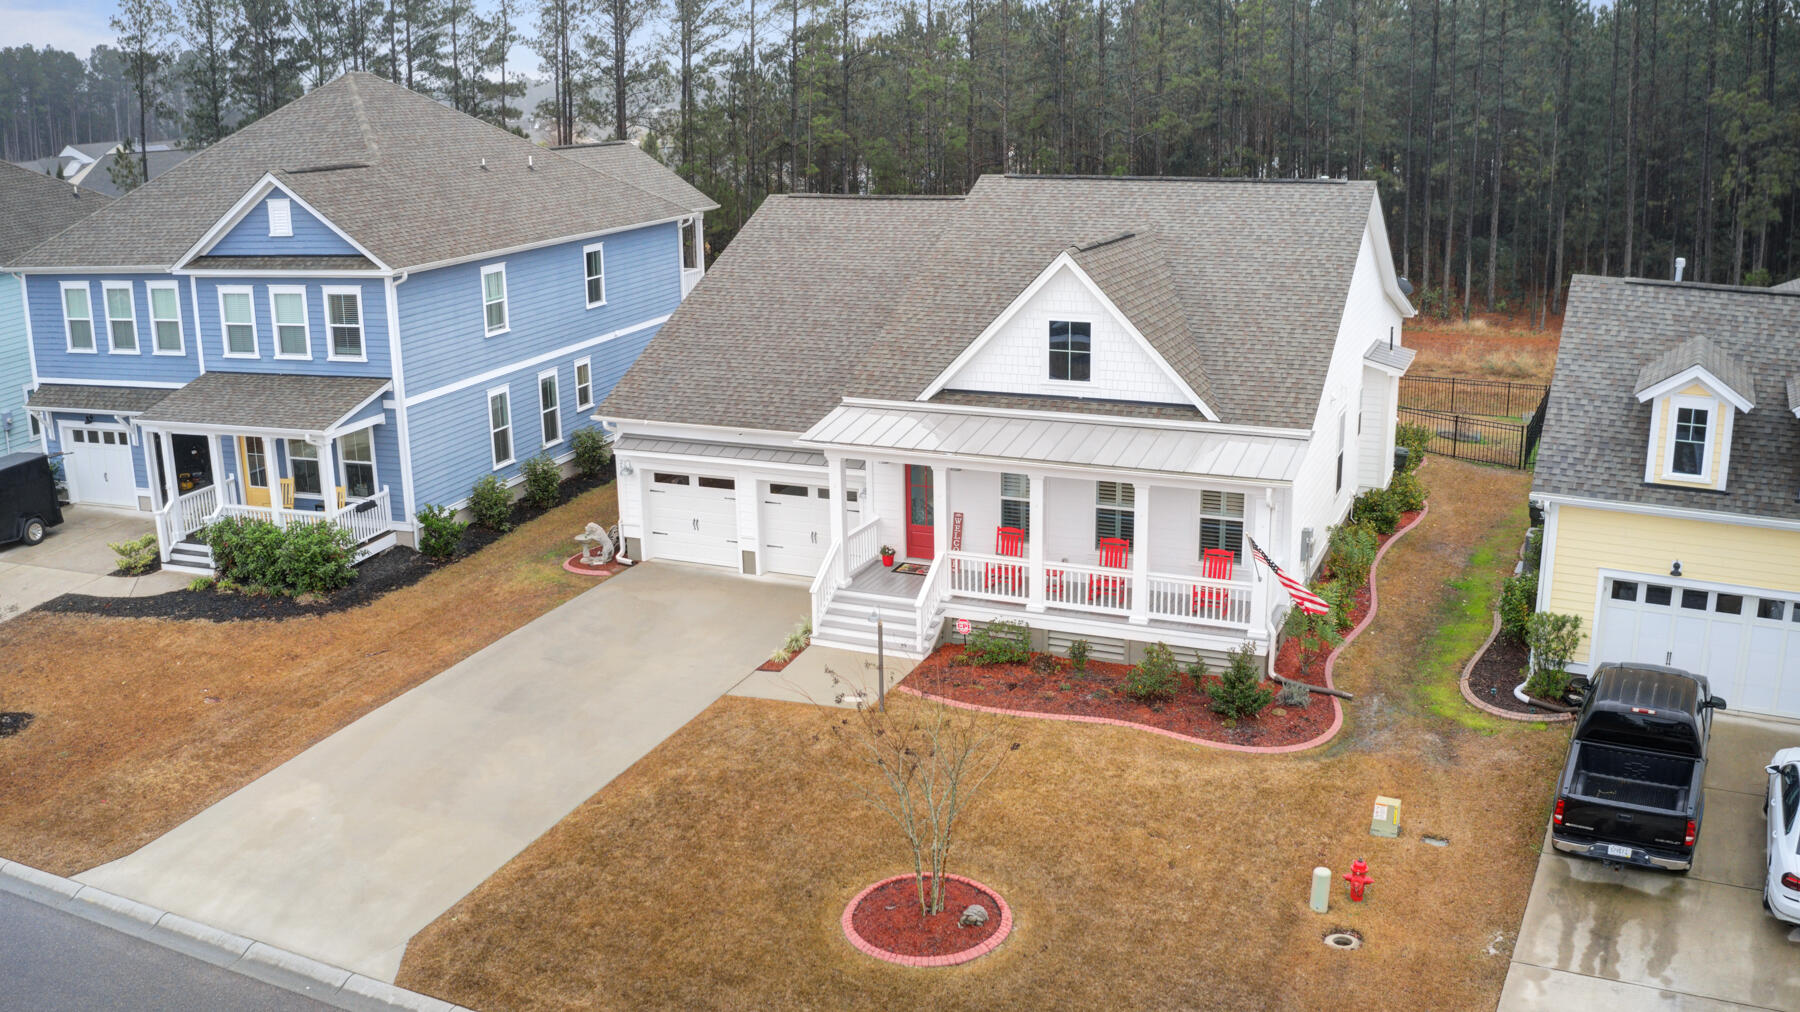 Cane Bay Plantation Homes For Sale - 251 Calm Water, Summerville, SC - 5